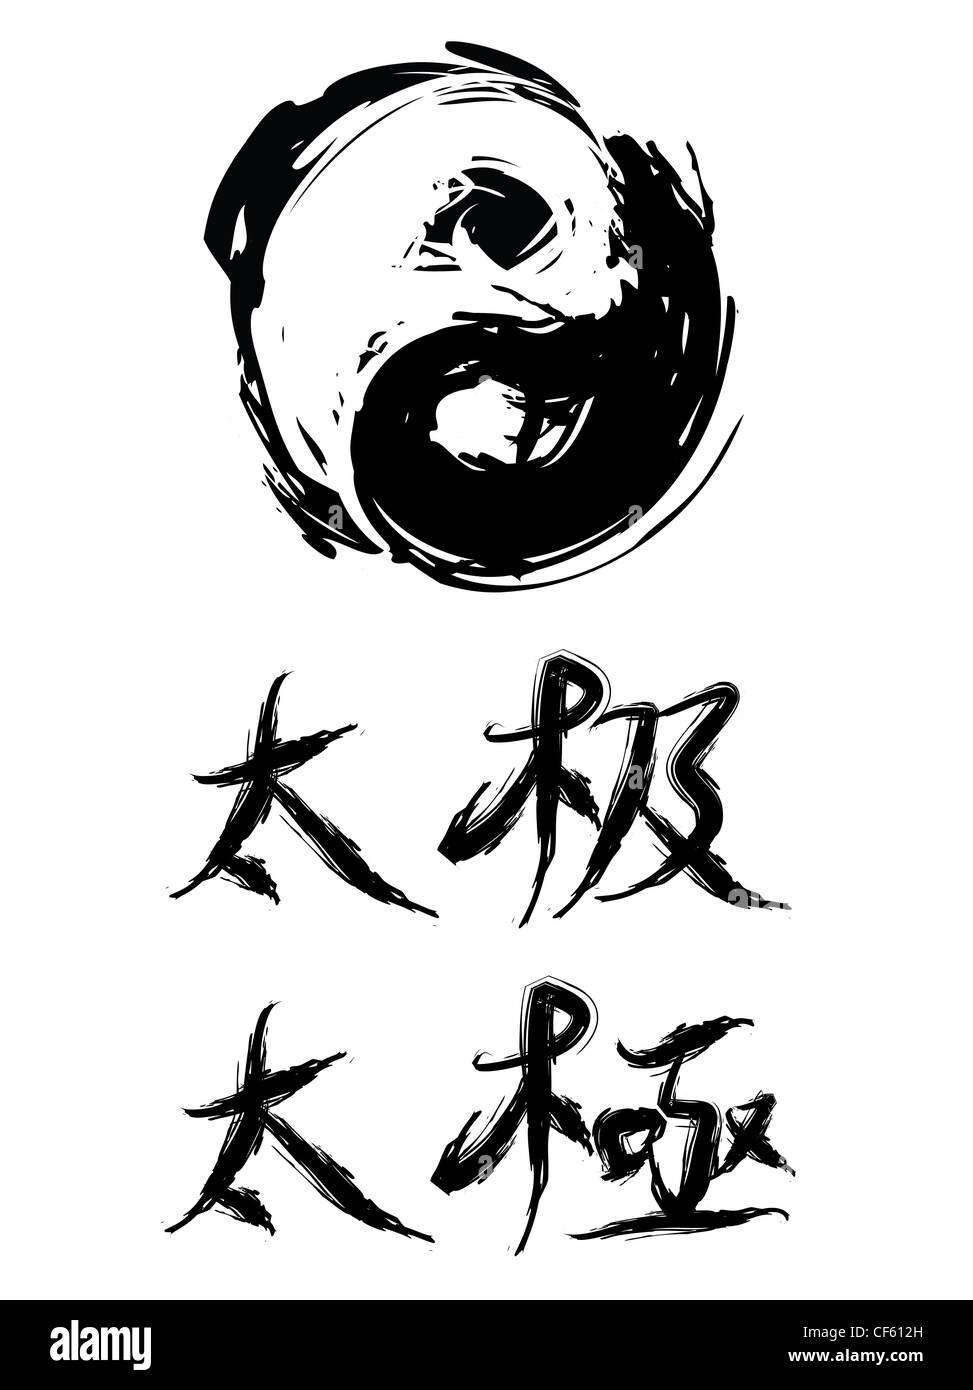 Yin yang symbol and chinese character oriental symbols stock photo yin yang symbol and chinese character oriental symbols buycottarizona Choice Image